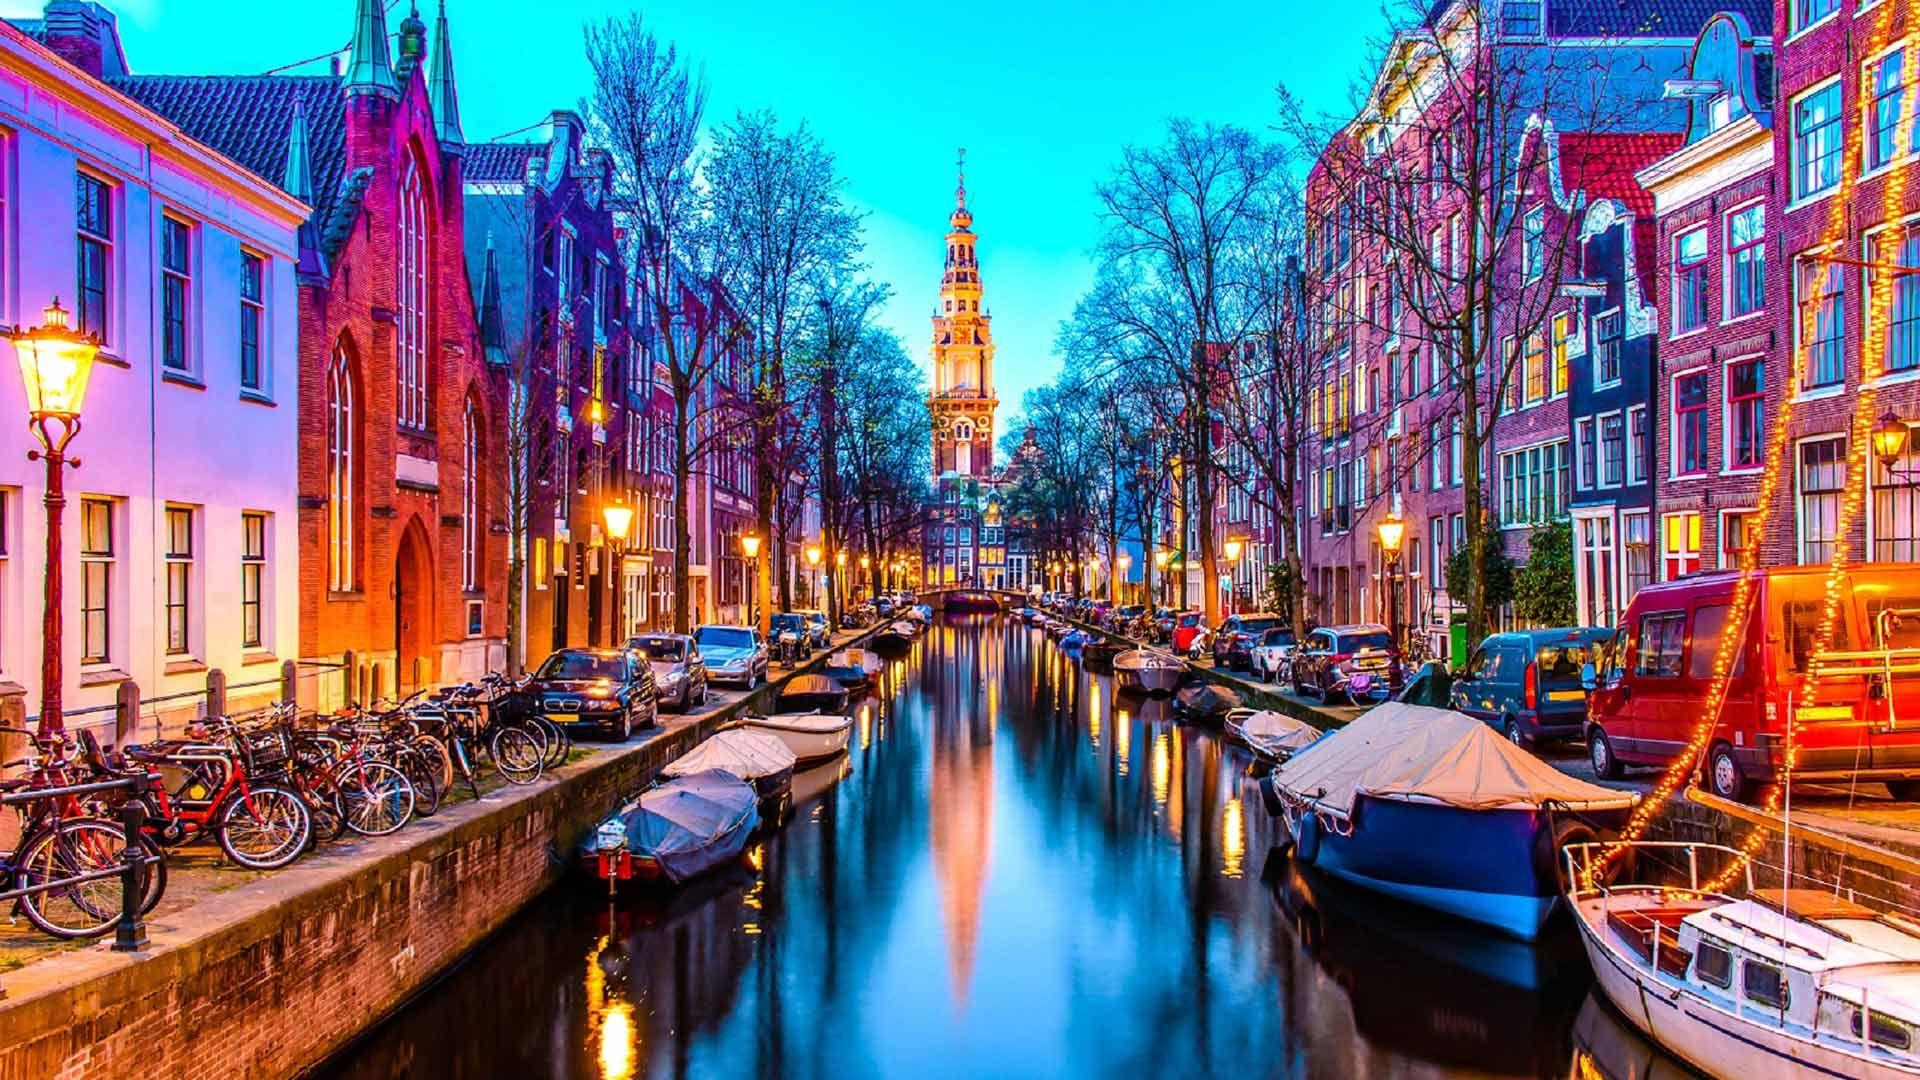 Amsterdam wallpaper download